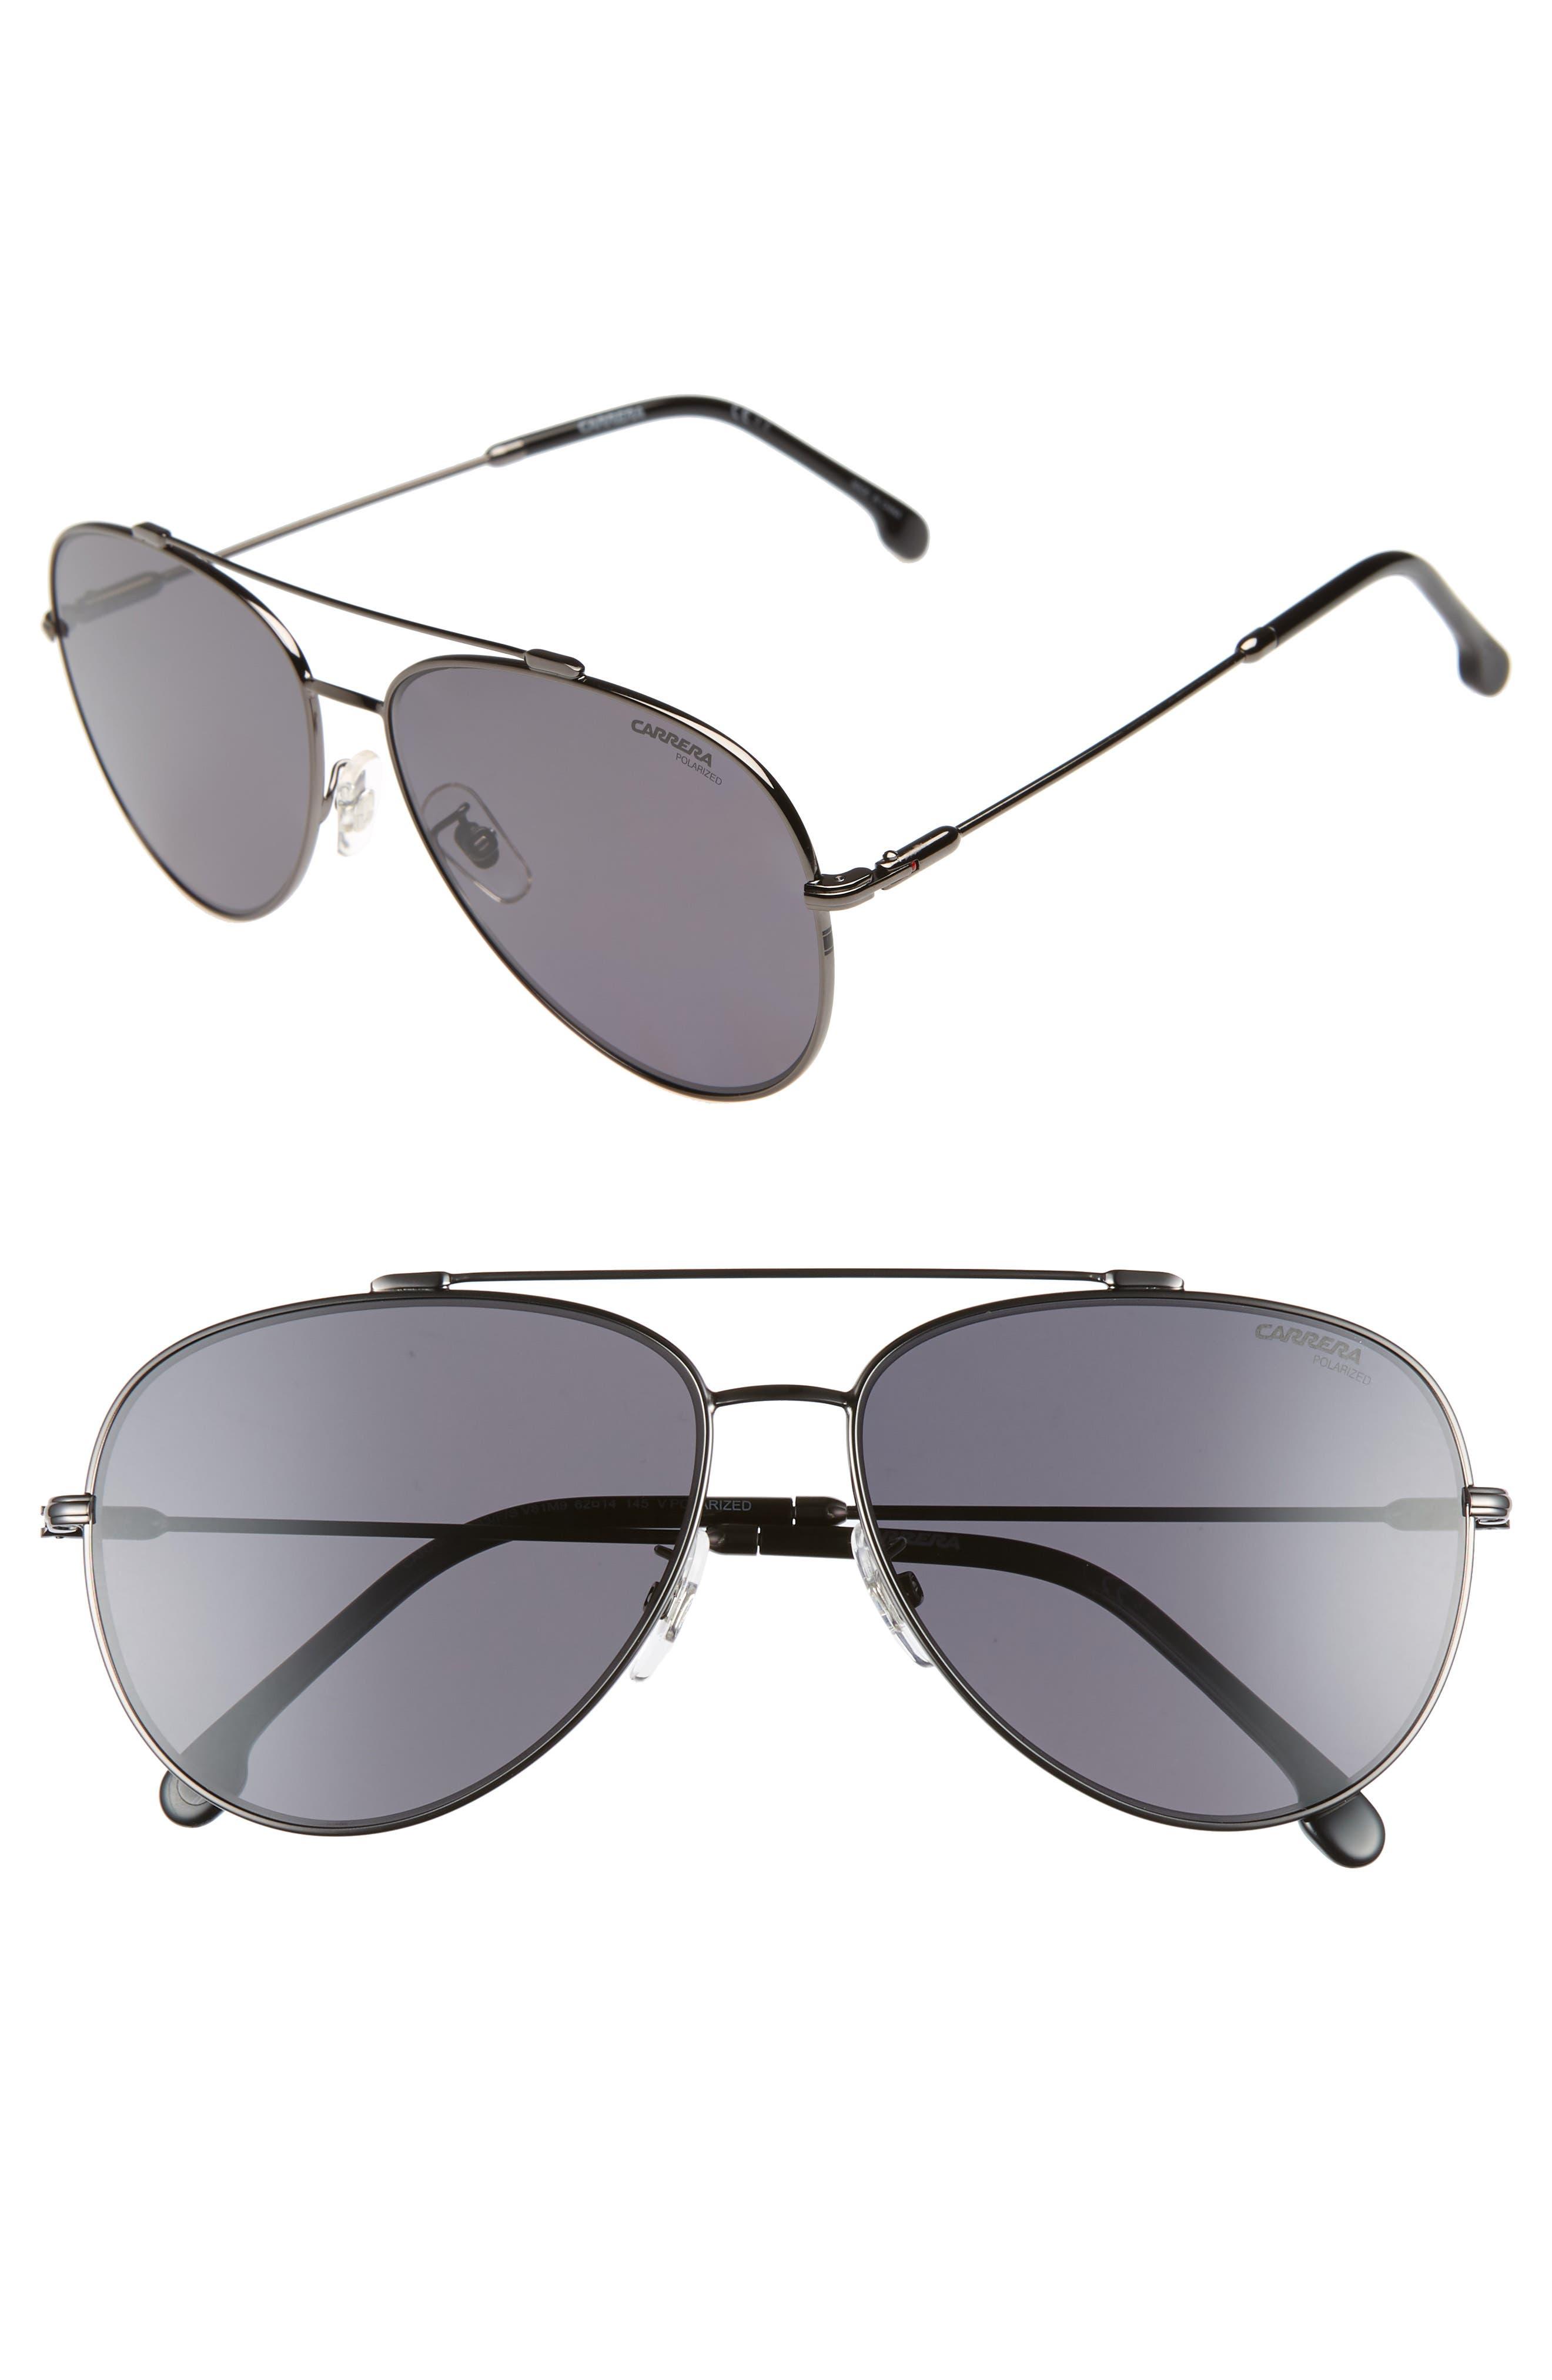 488d59ed8646 Carrera Eyewear 62Mm Polarized Aviator Sunglasses -